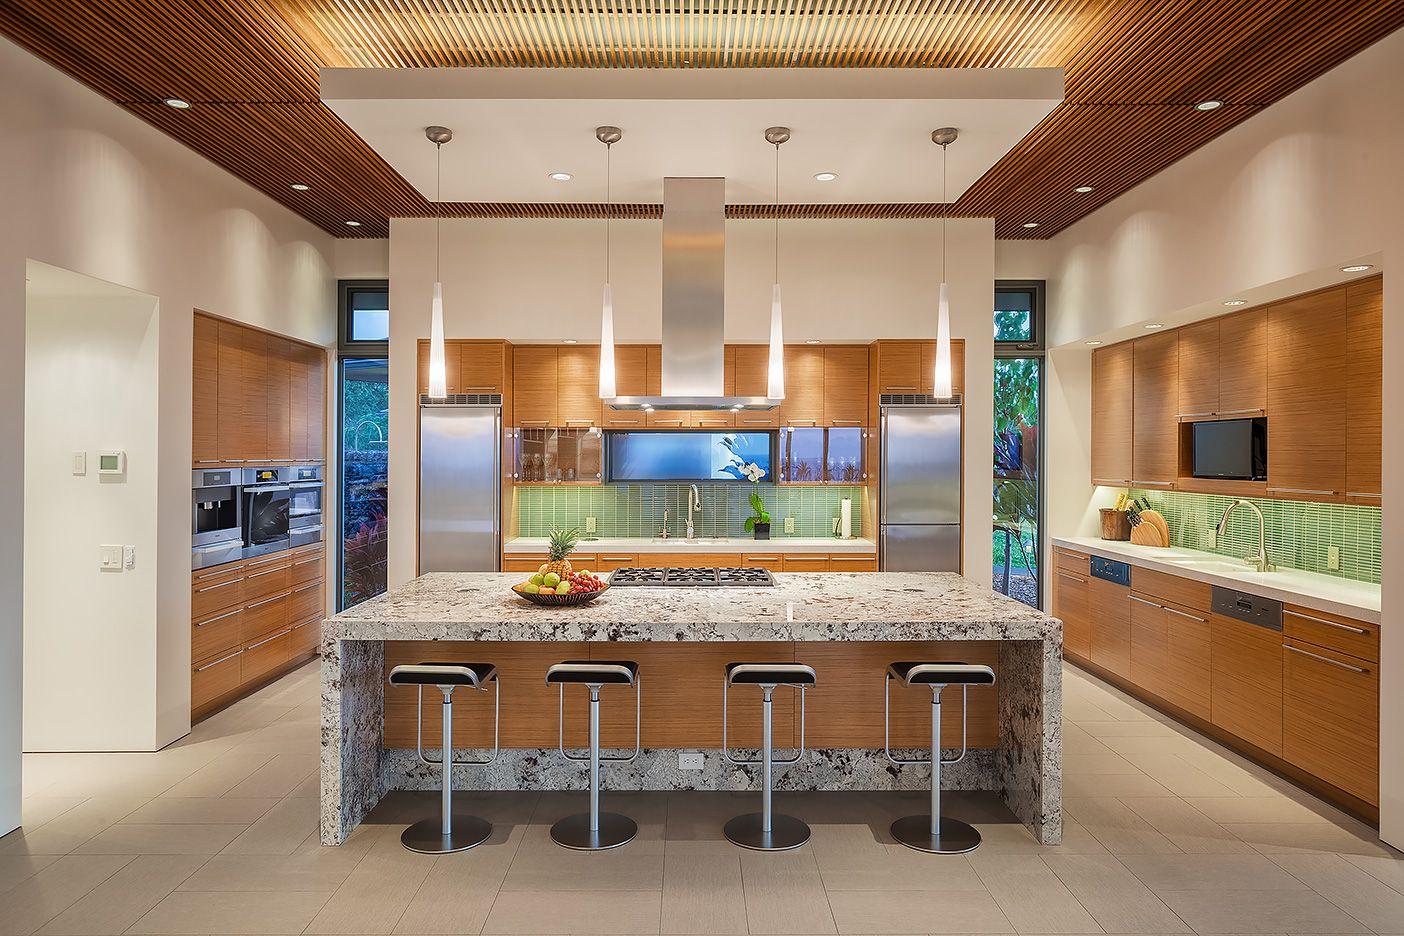 Luxury Kitchen Hawaii  Kitchen Spaces  Pinterest  Luxury Kitchens Glamorous Kitchen Design Hawaii Decorating Inspiration